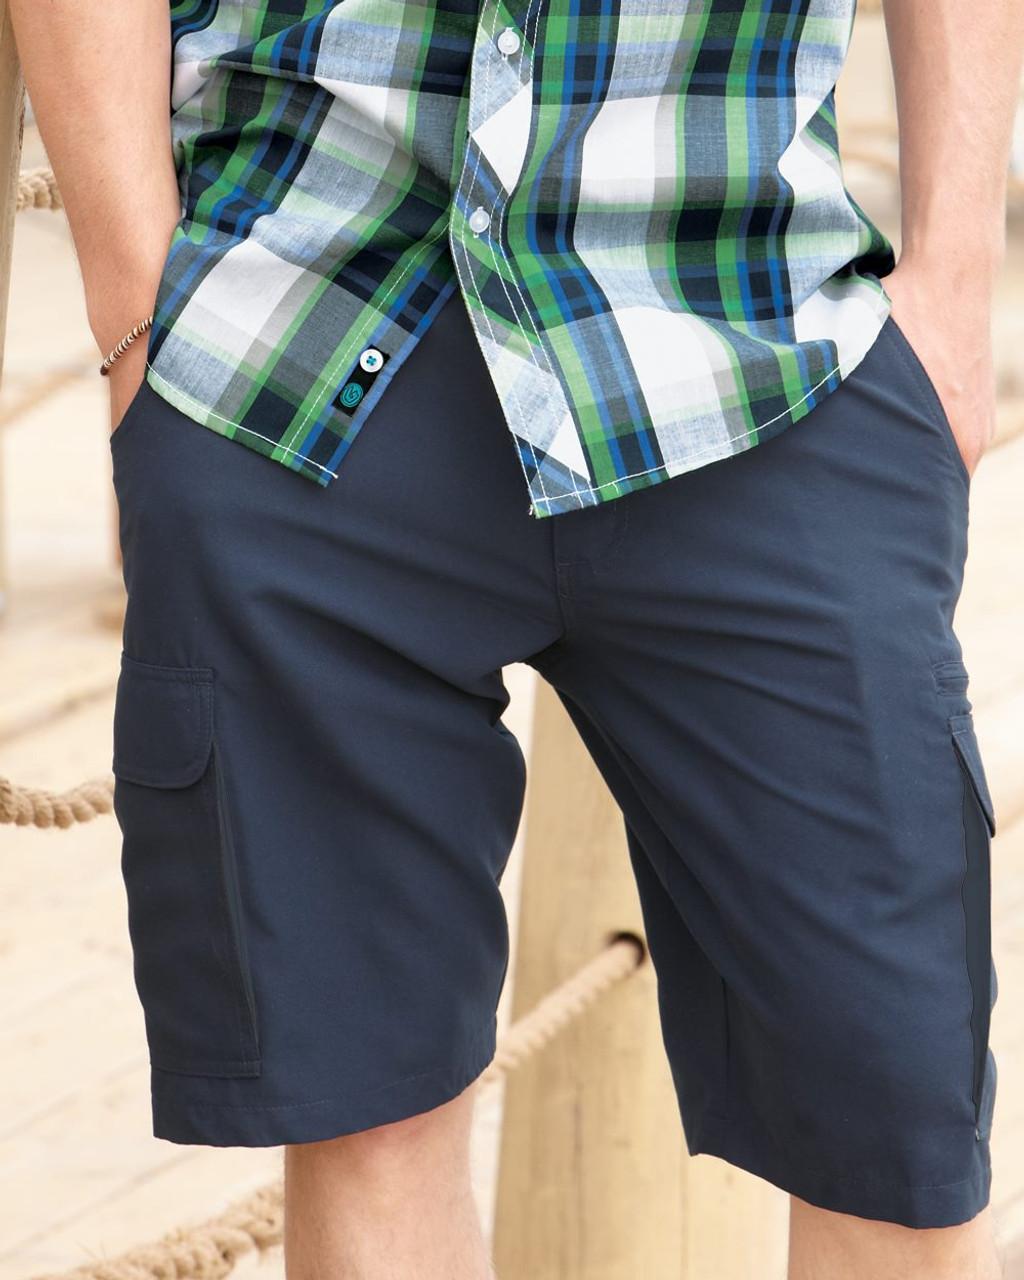 Blue summer shorts for men